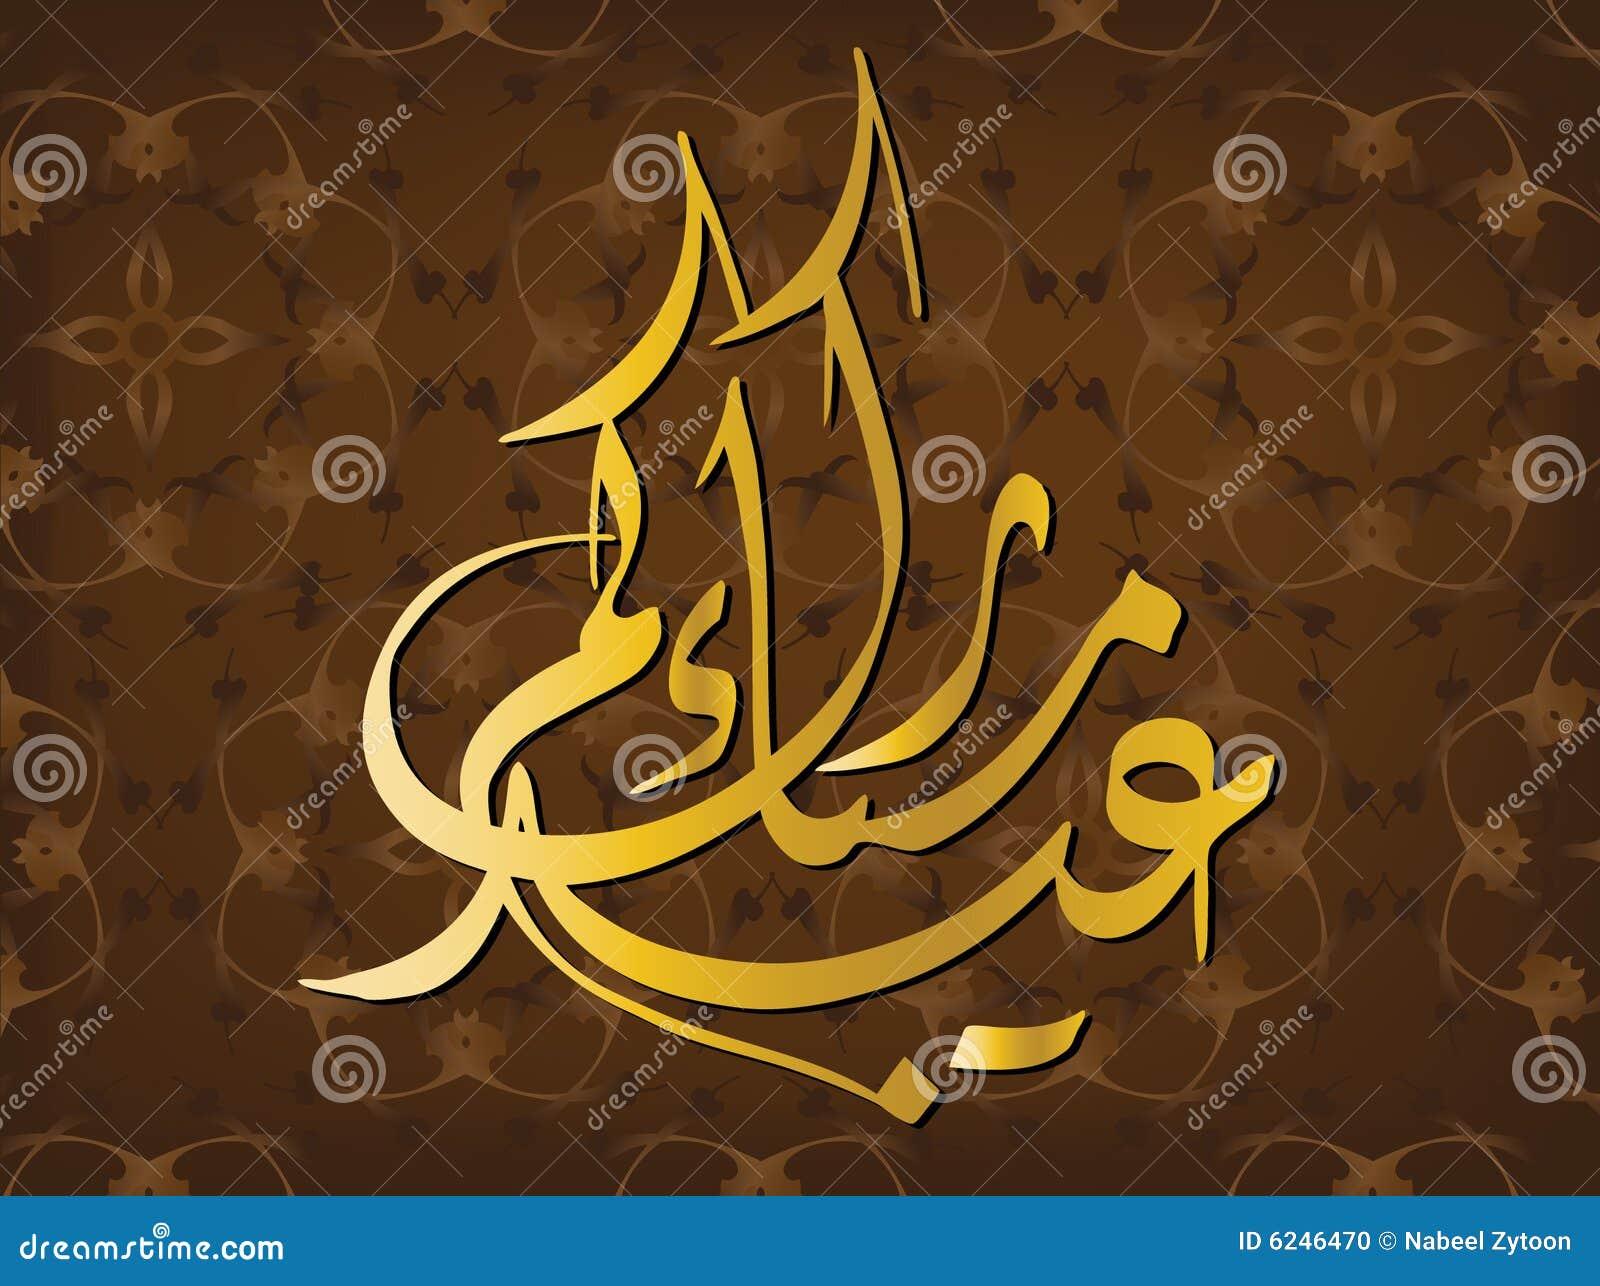 Islamic illustration stock vector. illustration of celebration 6246470